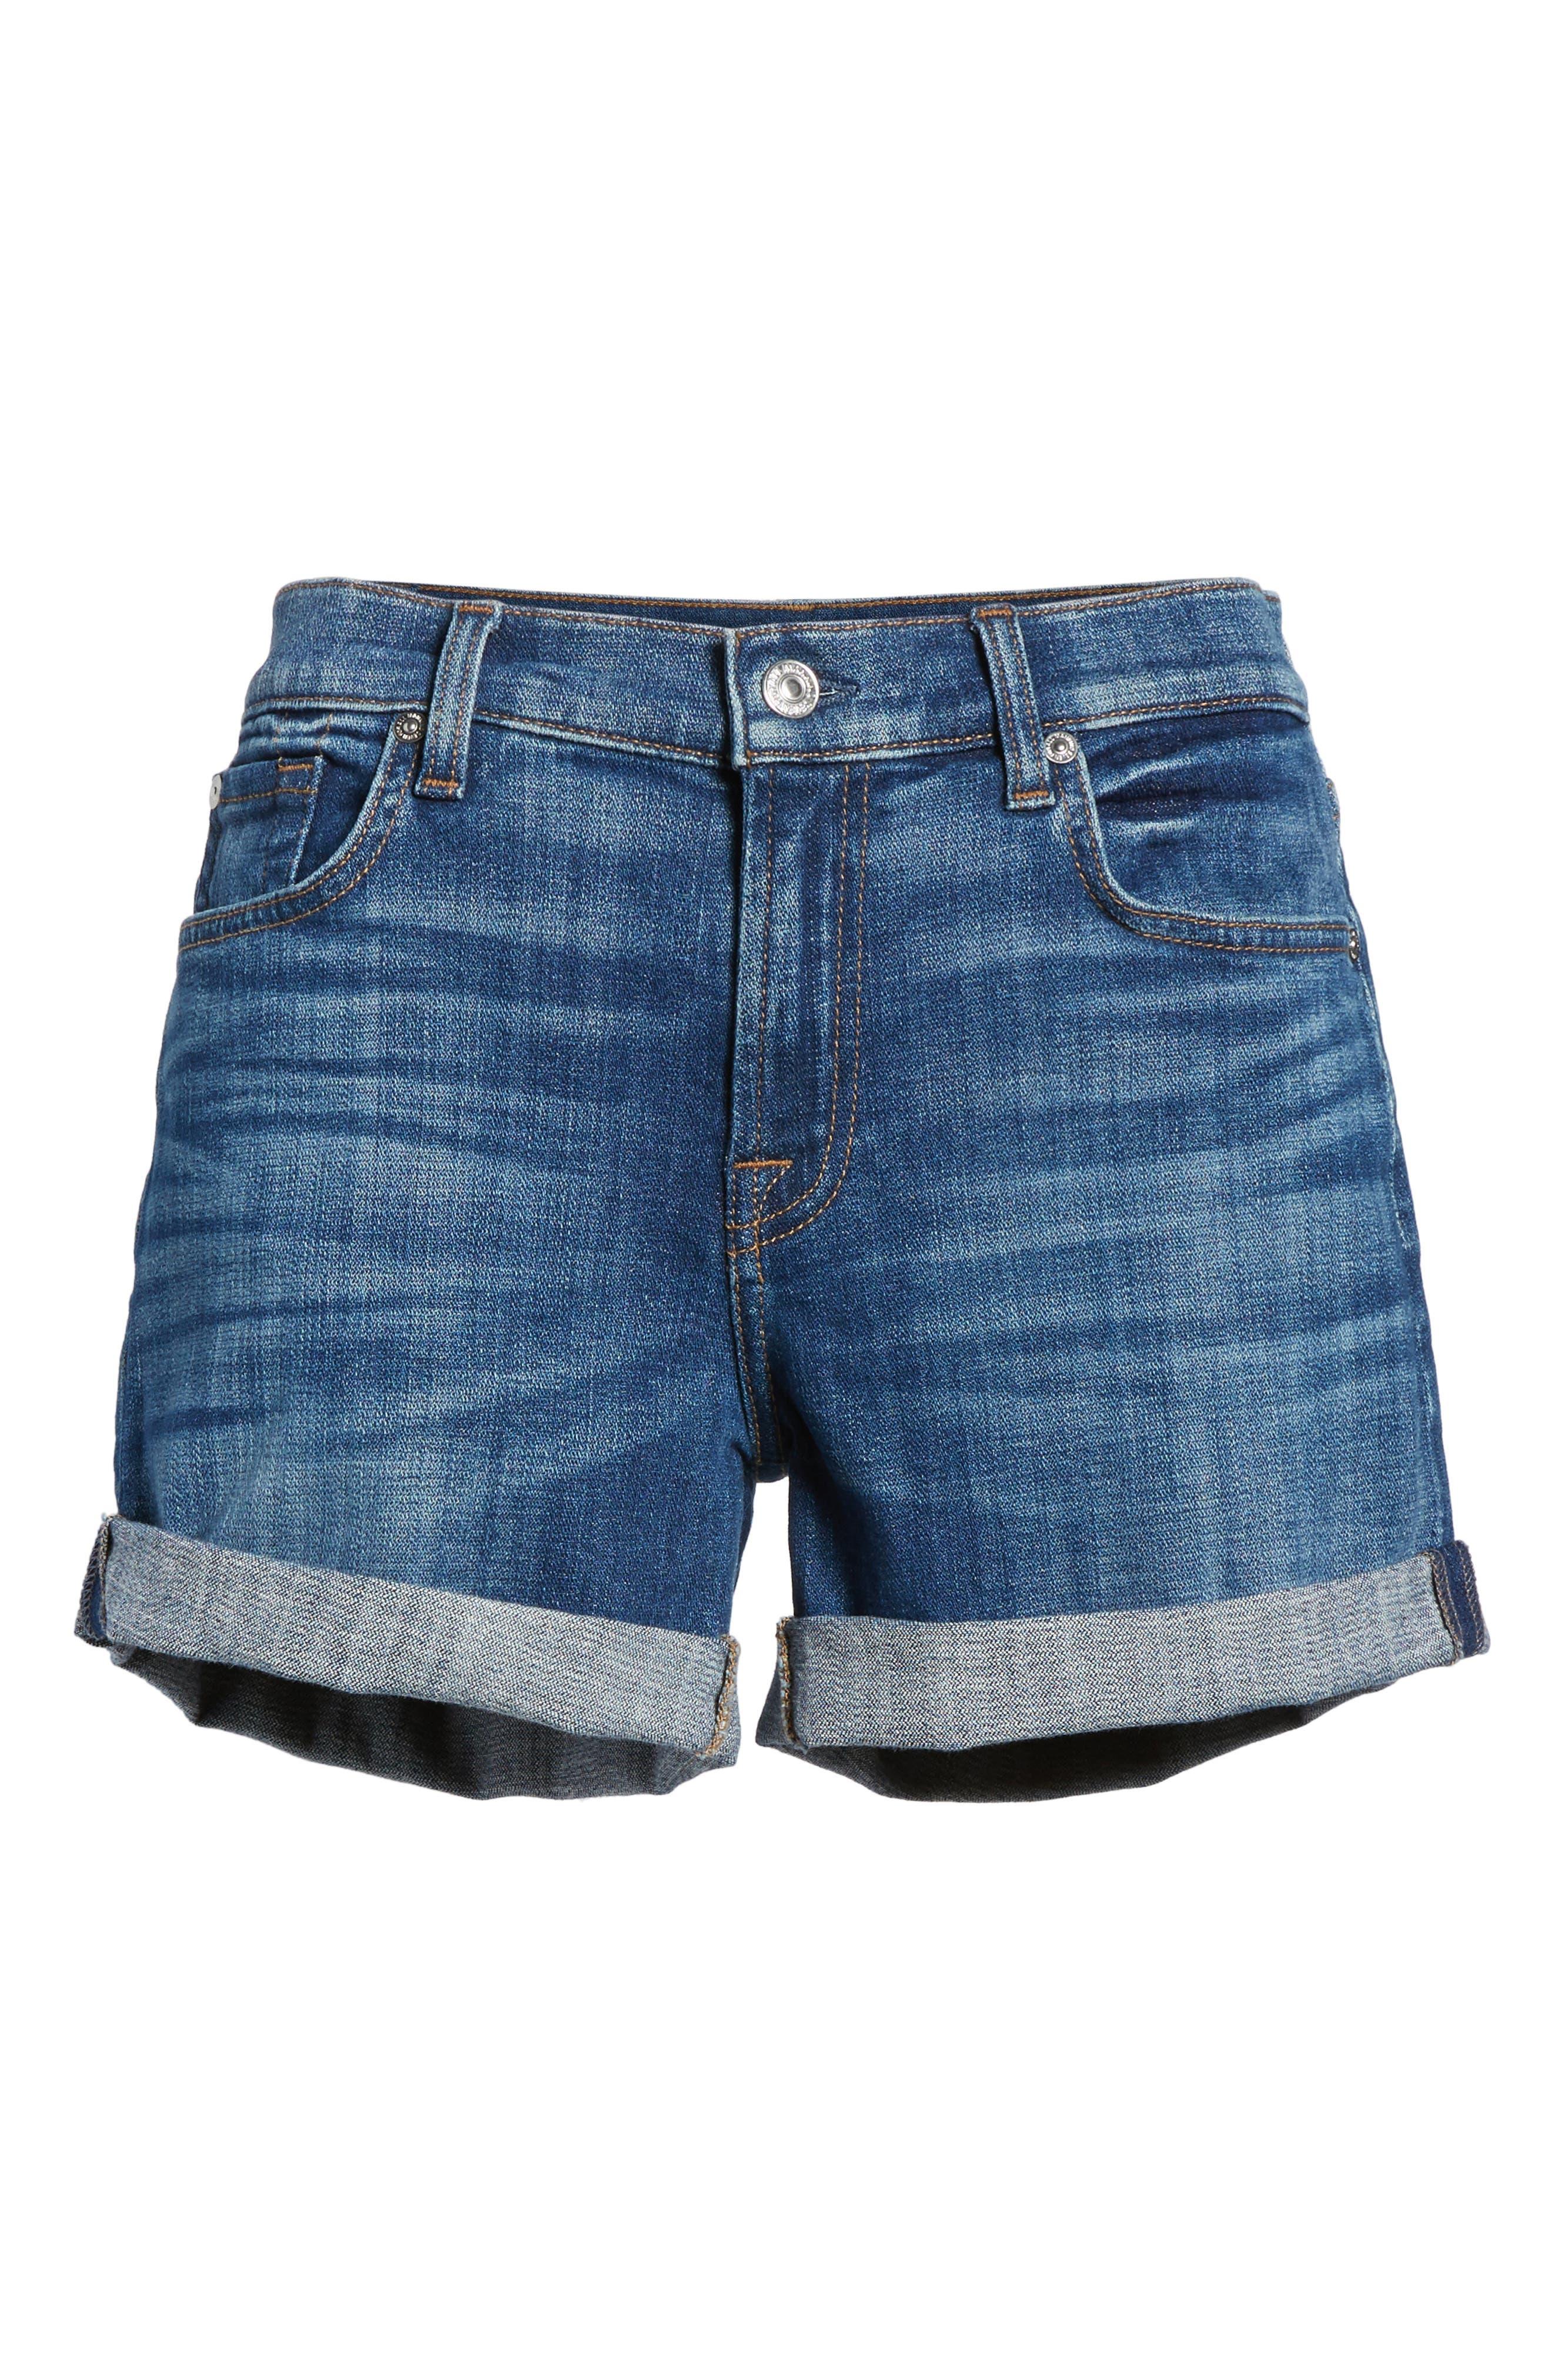 Roll Cuff Denim Shorts,                             Alternate thumbnail 7, color,                             400